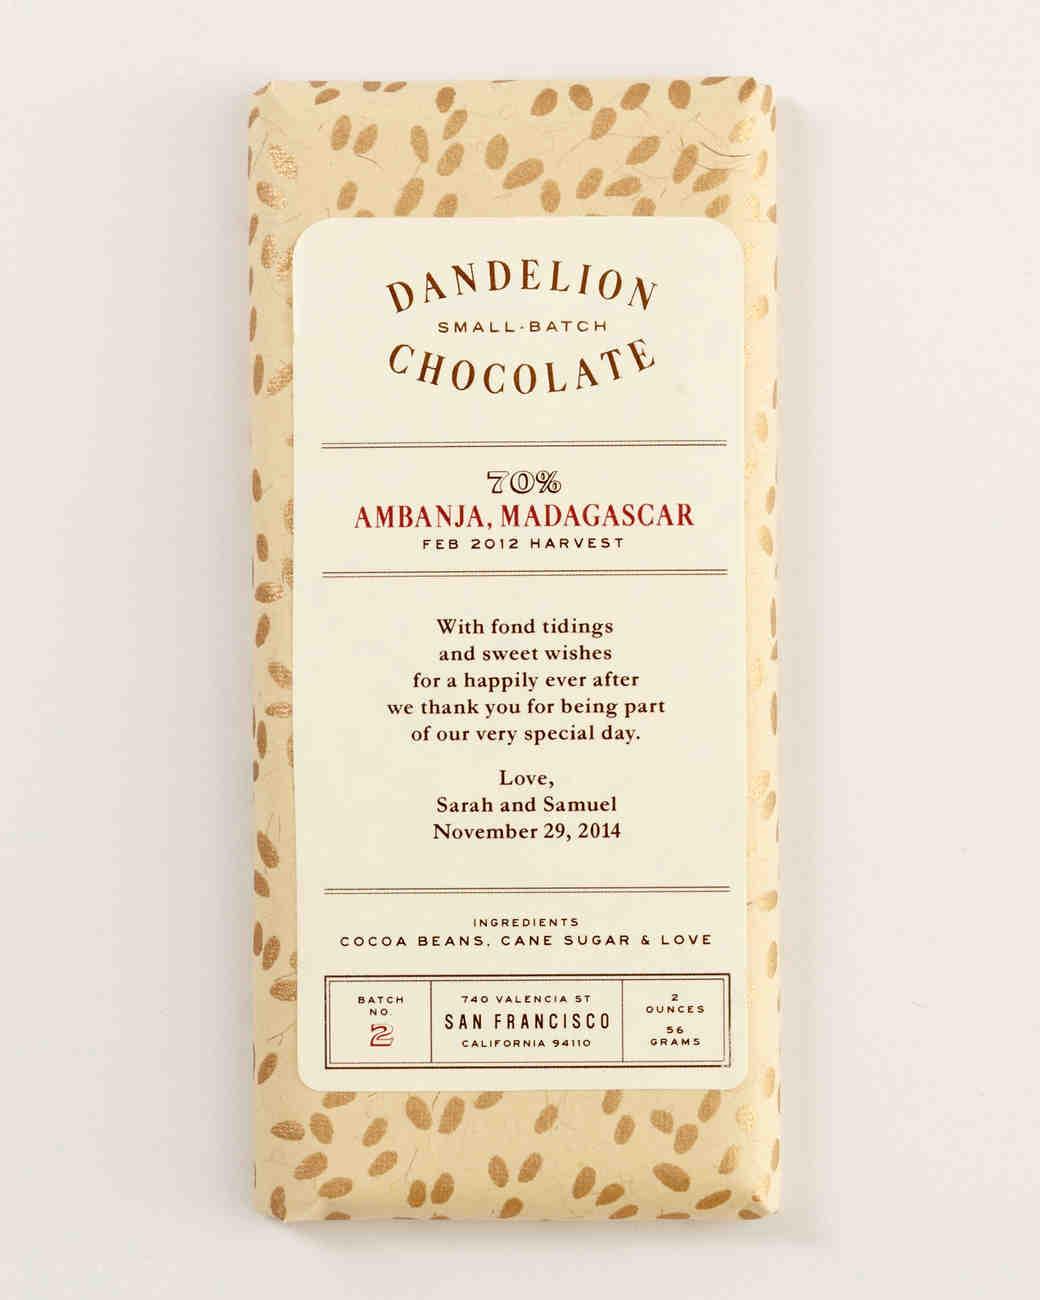 wd110451-dandelion-chocolate-168.jpg